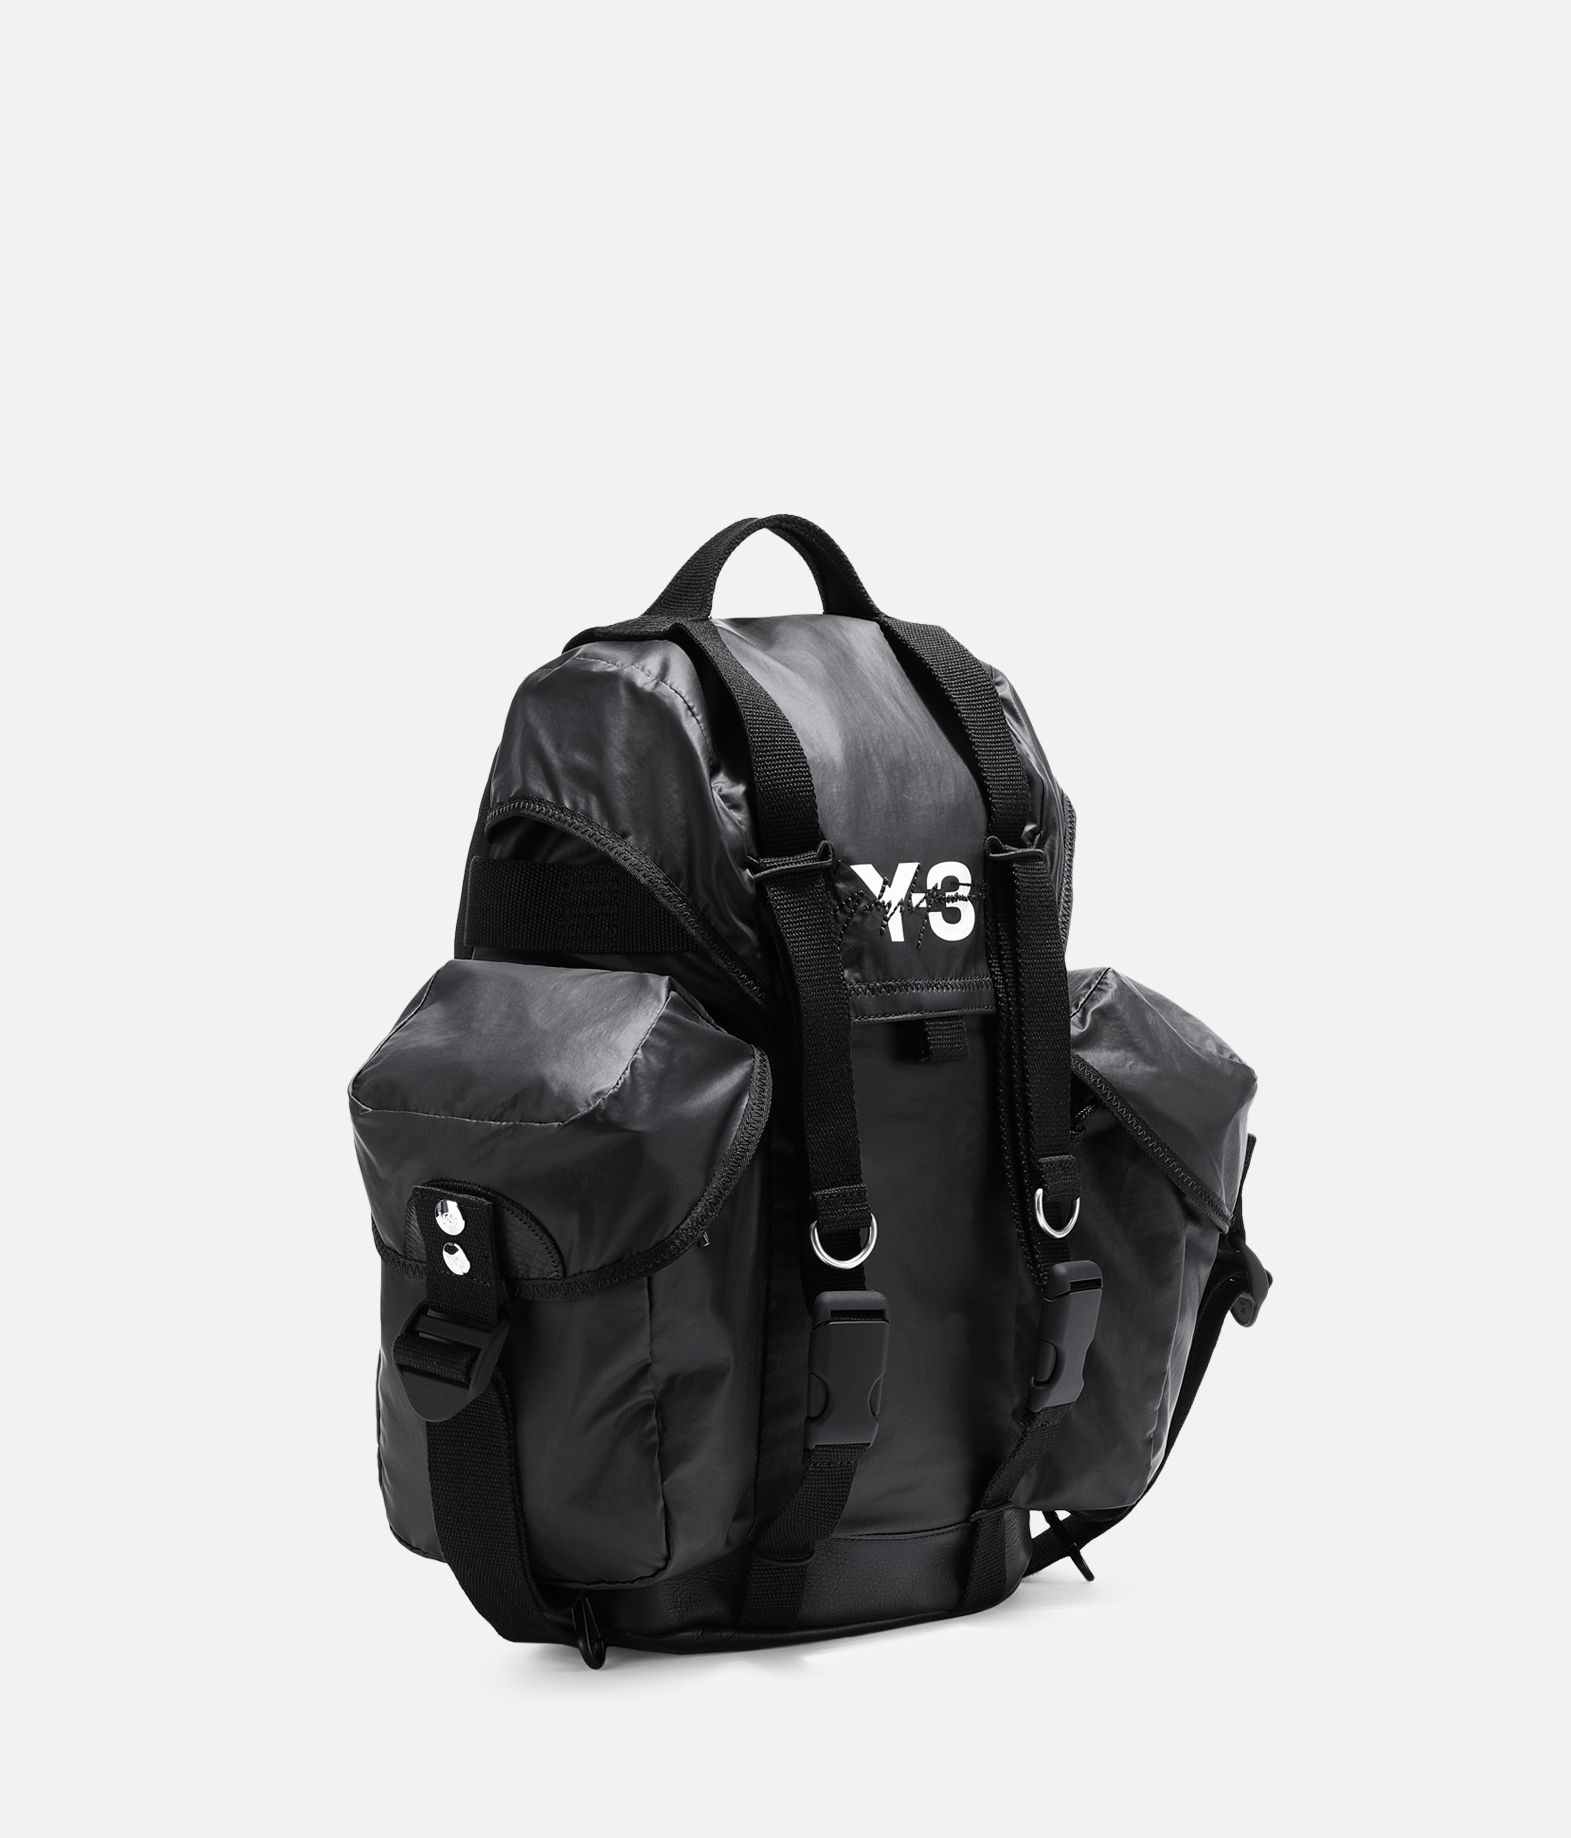 Y-3 Y-3 XS Utility Bag Rucksack E r